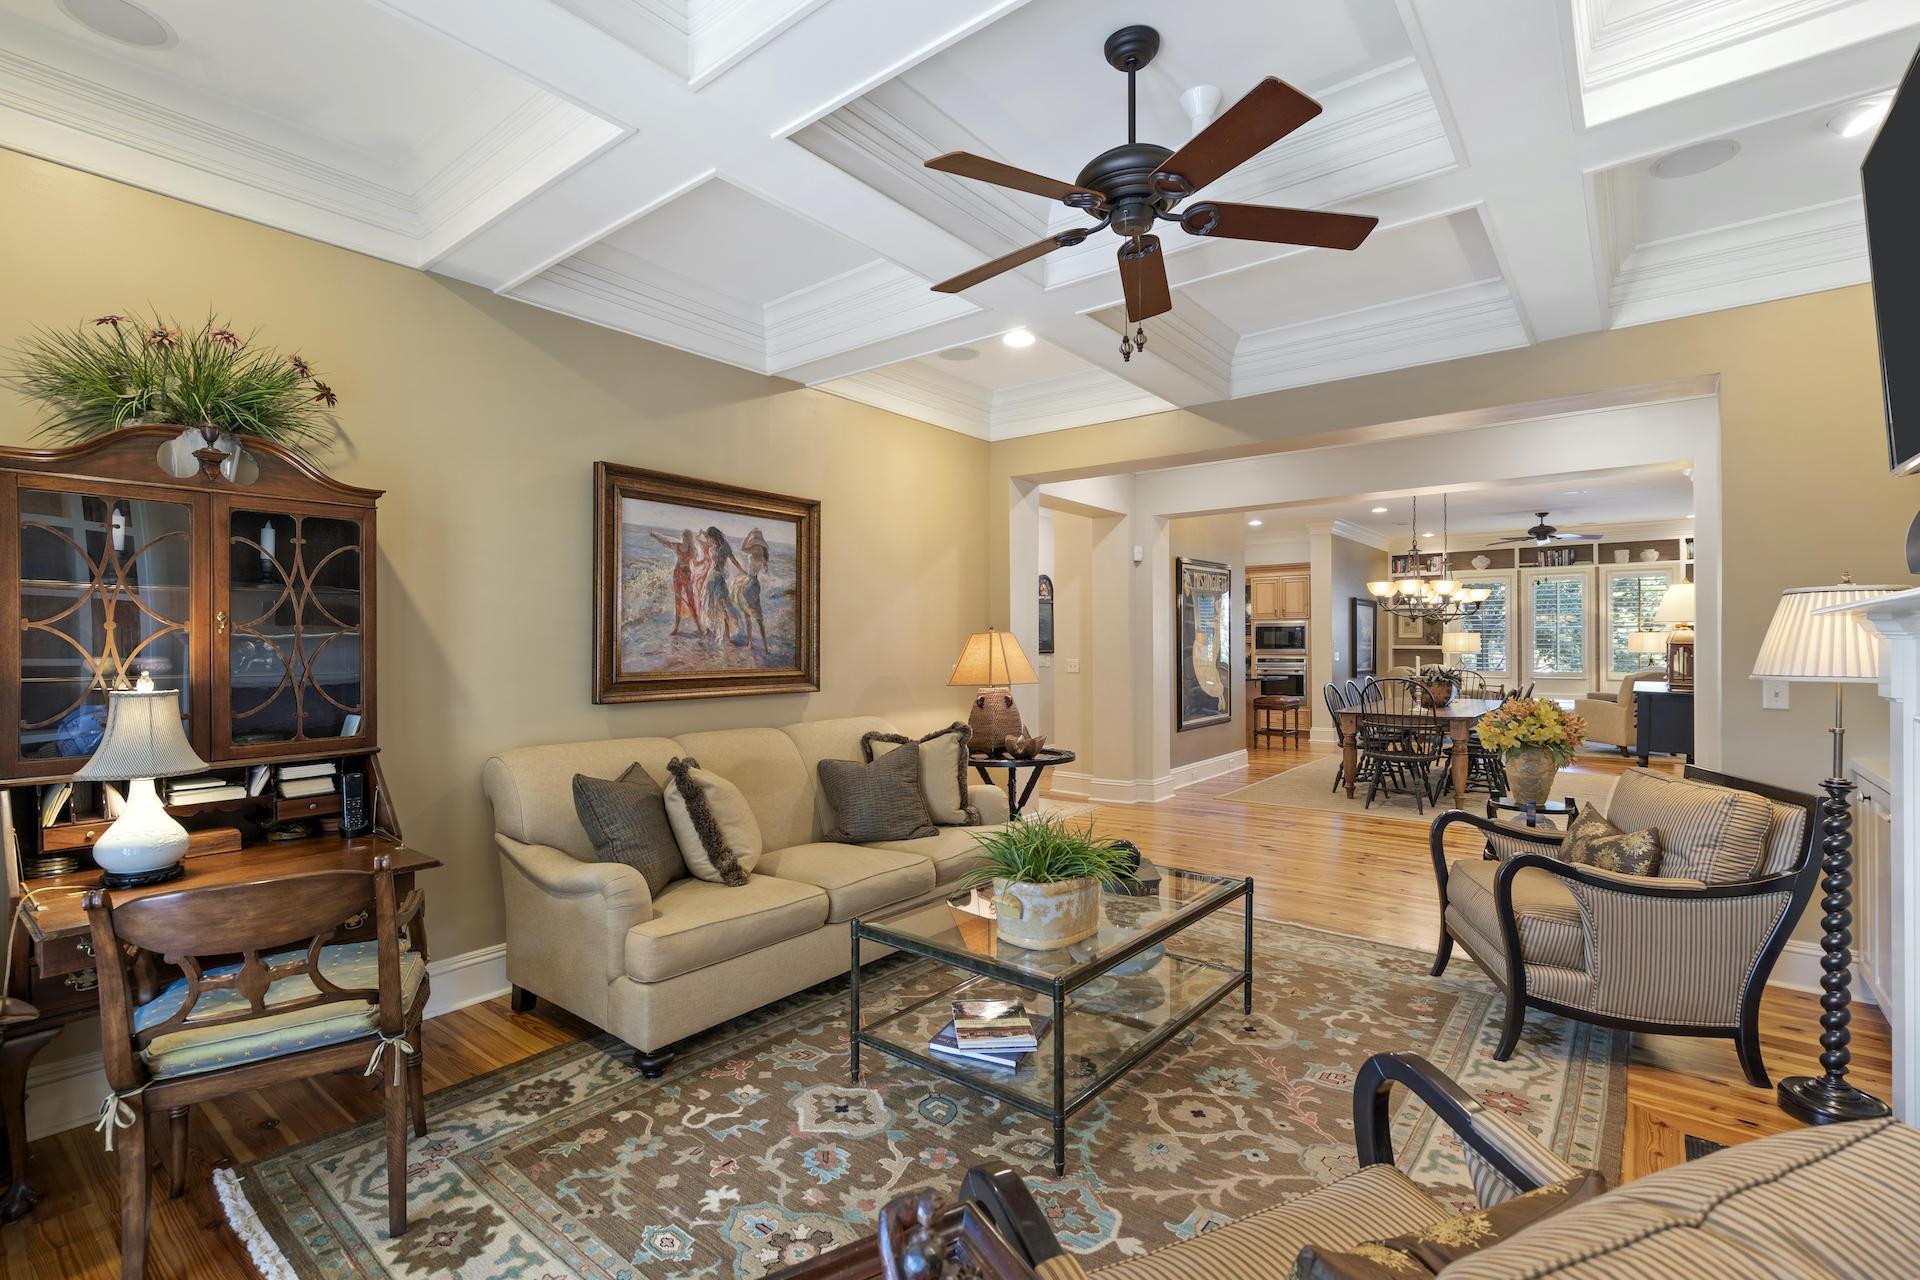 Daniel Island Homes For Sale - 250 Island Park, Charleston, SC - 16